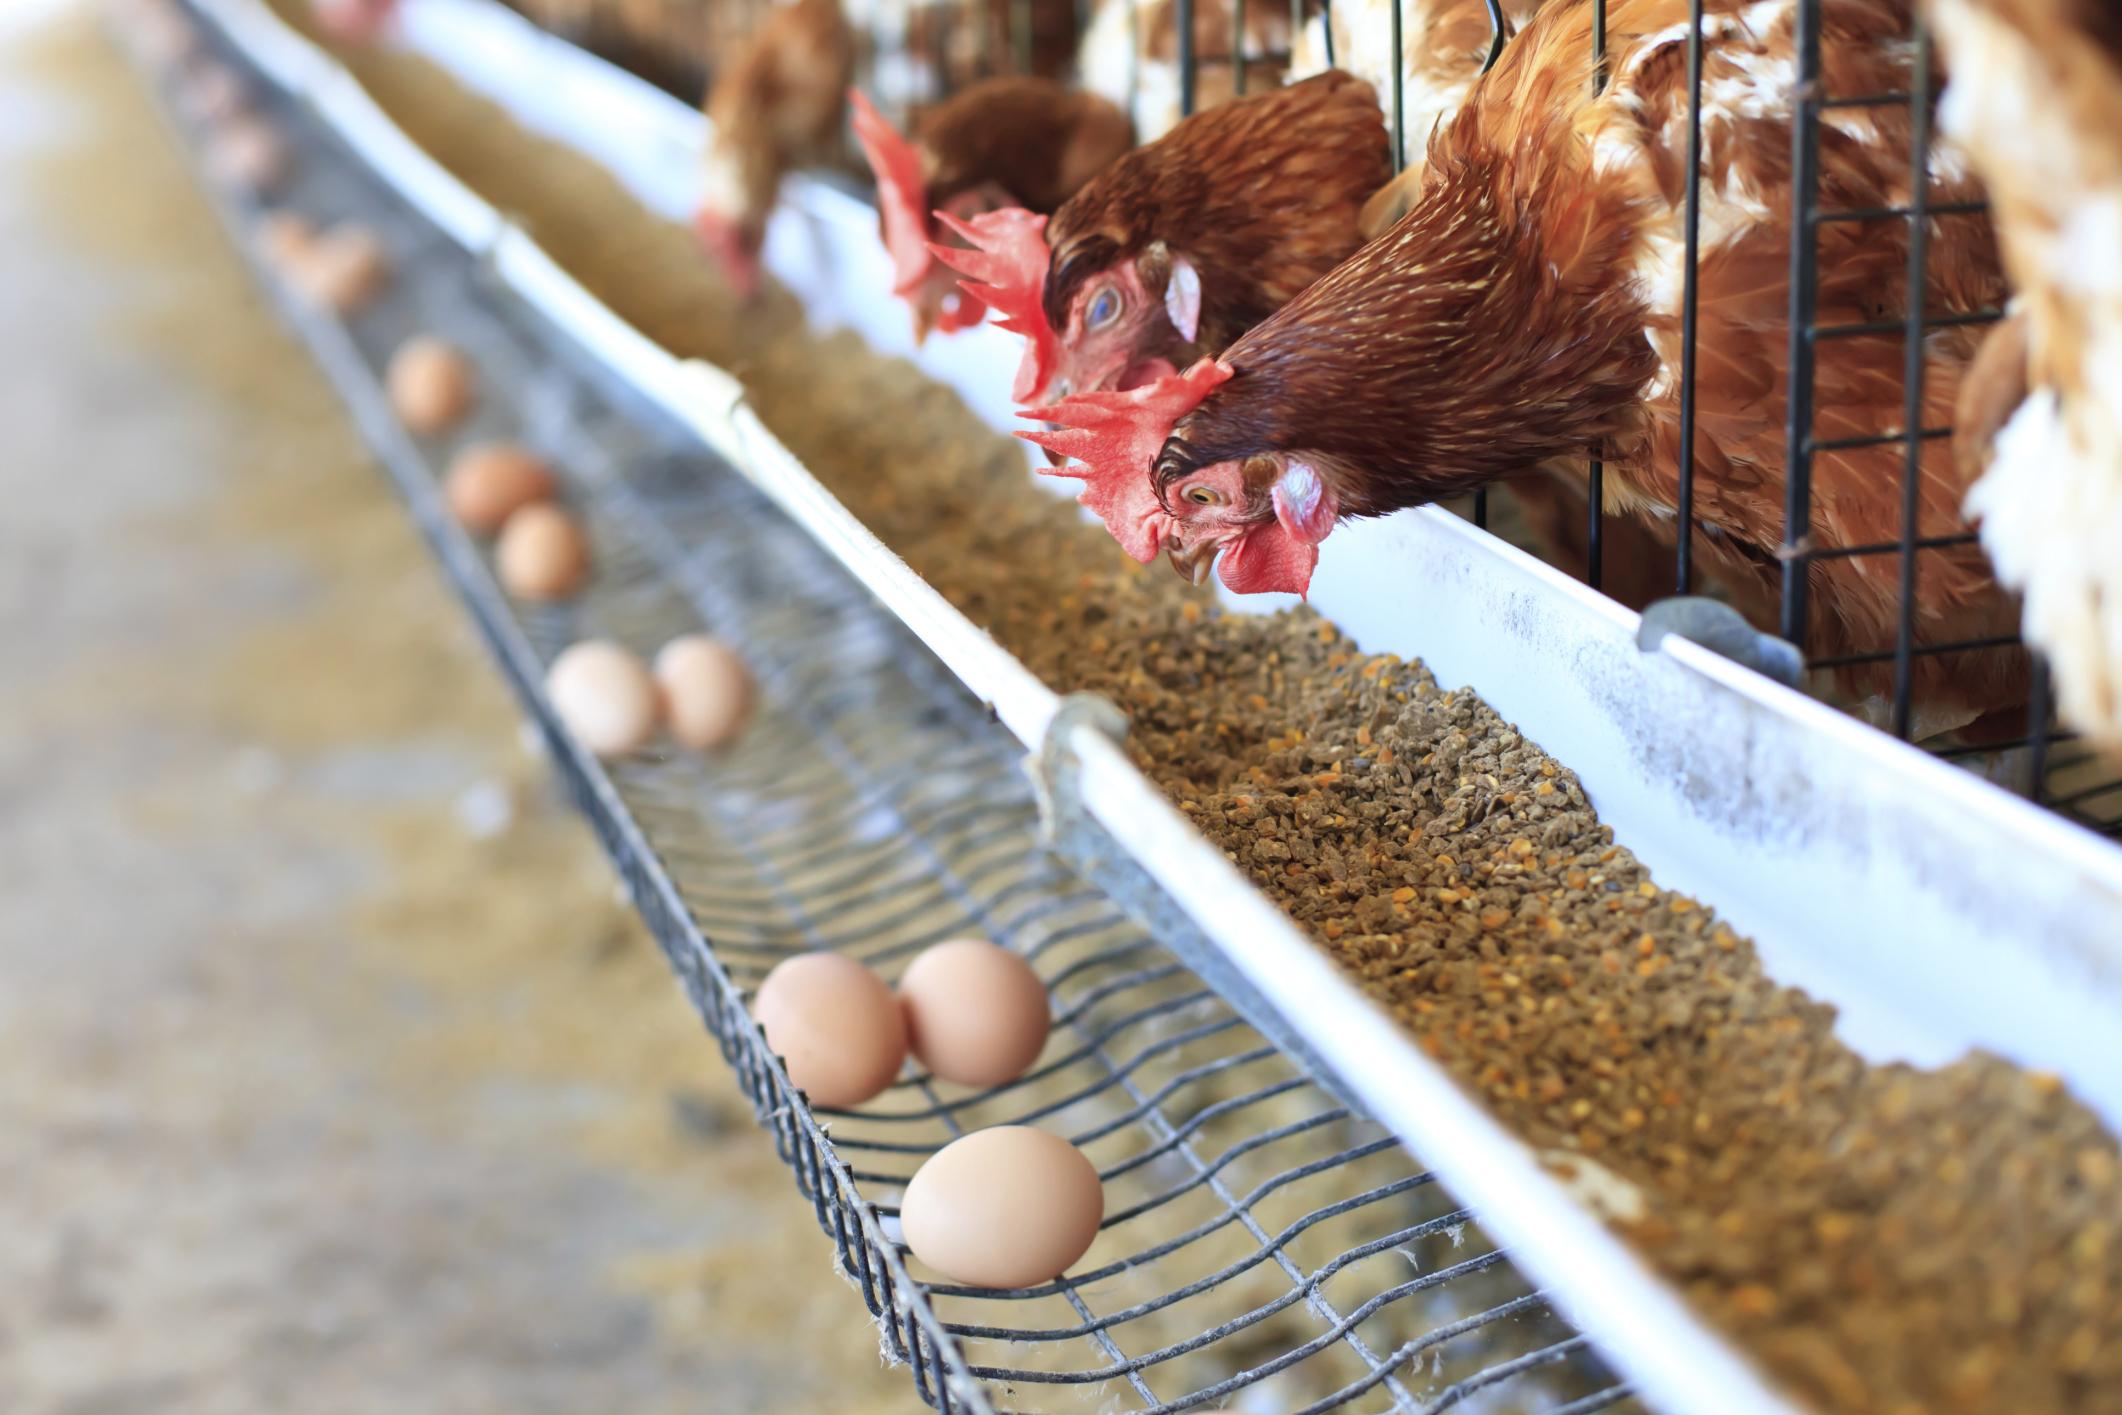 How Do Chickens Fertilize Eggs? | Sciencing